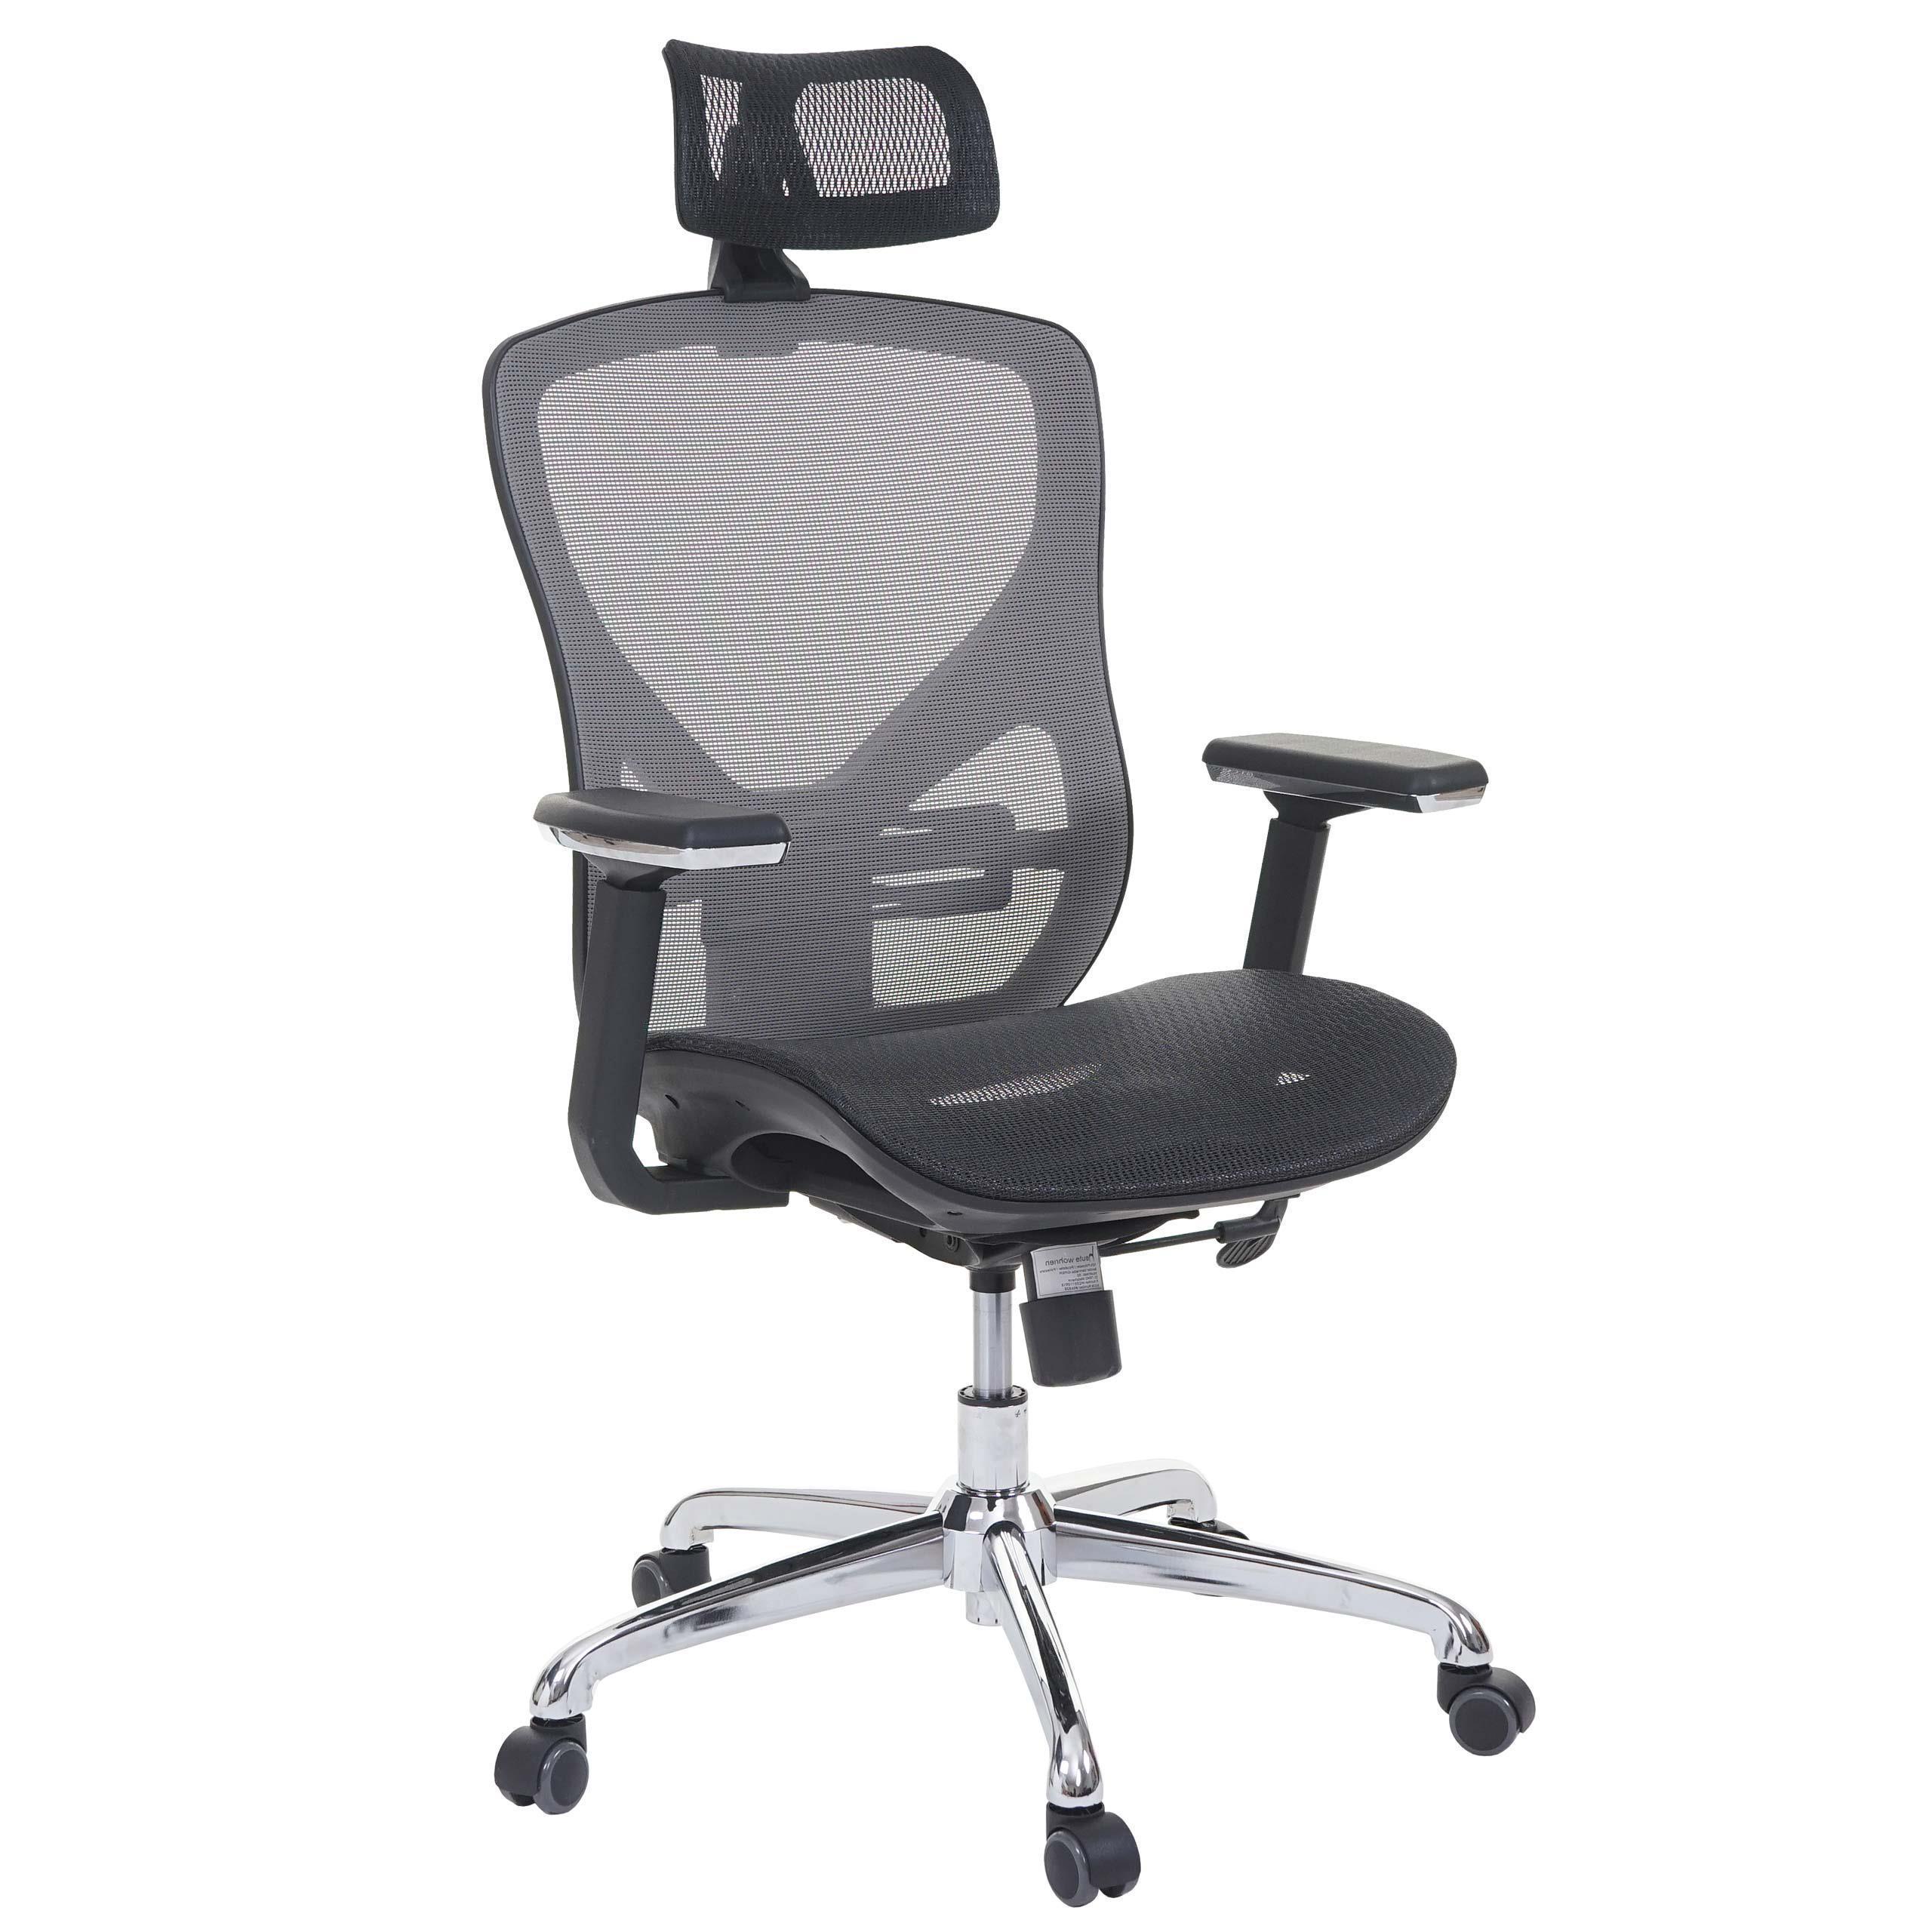 Sedia ergonomica lambi completamente regolabile supporto for Sedia ergonomica